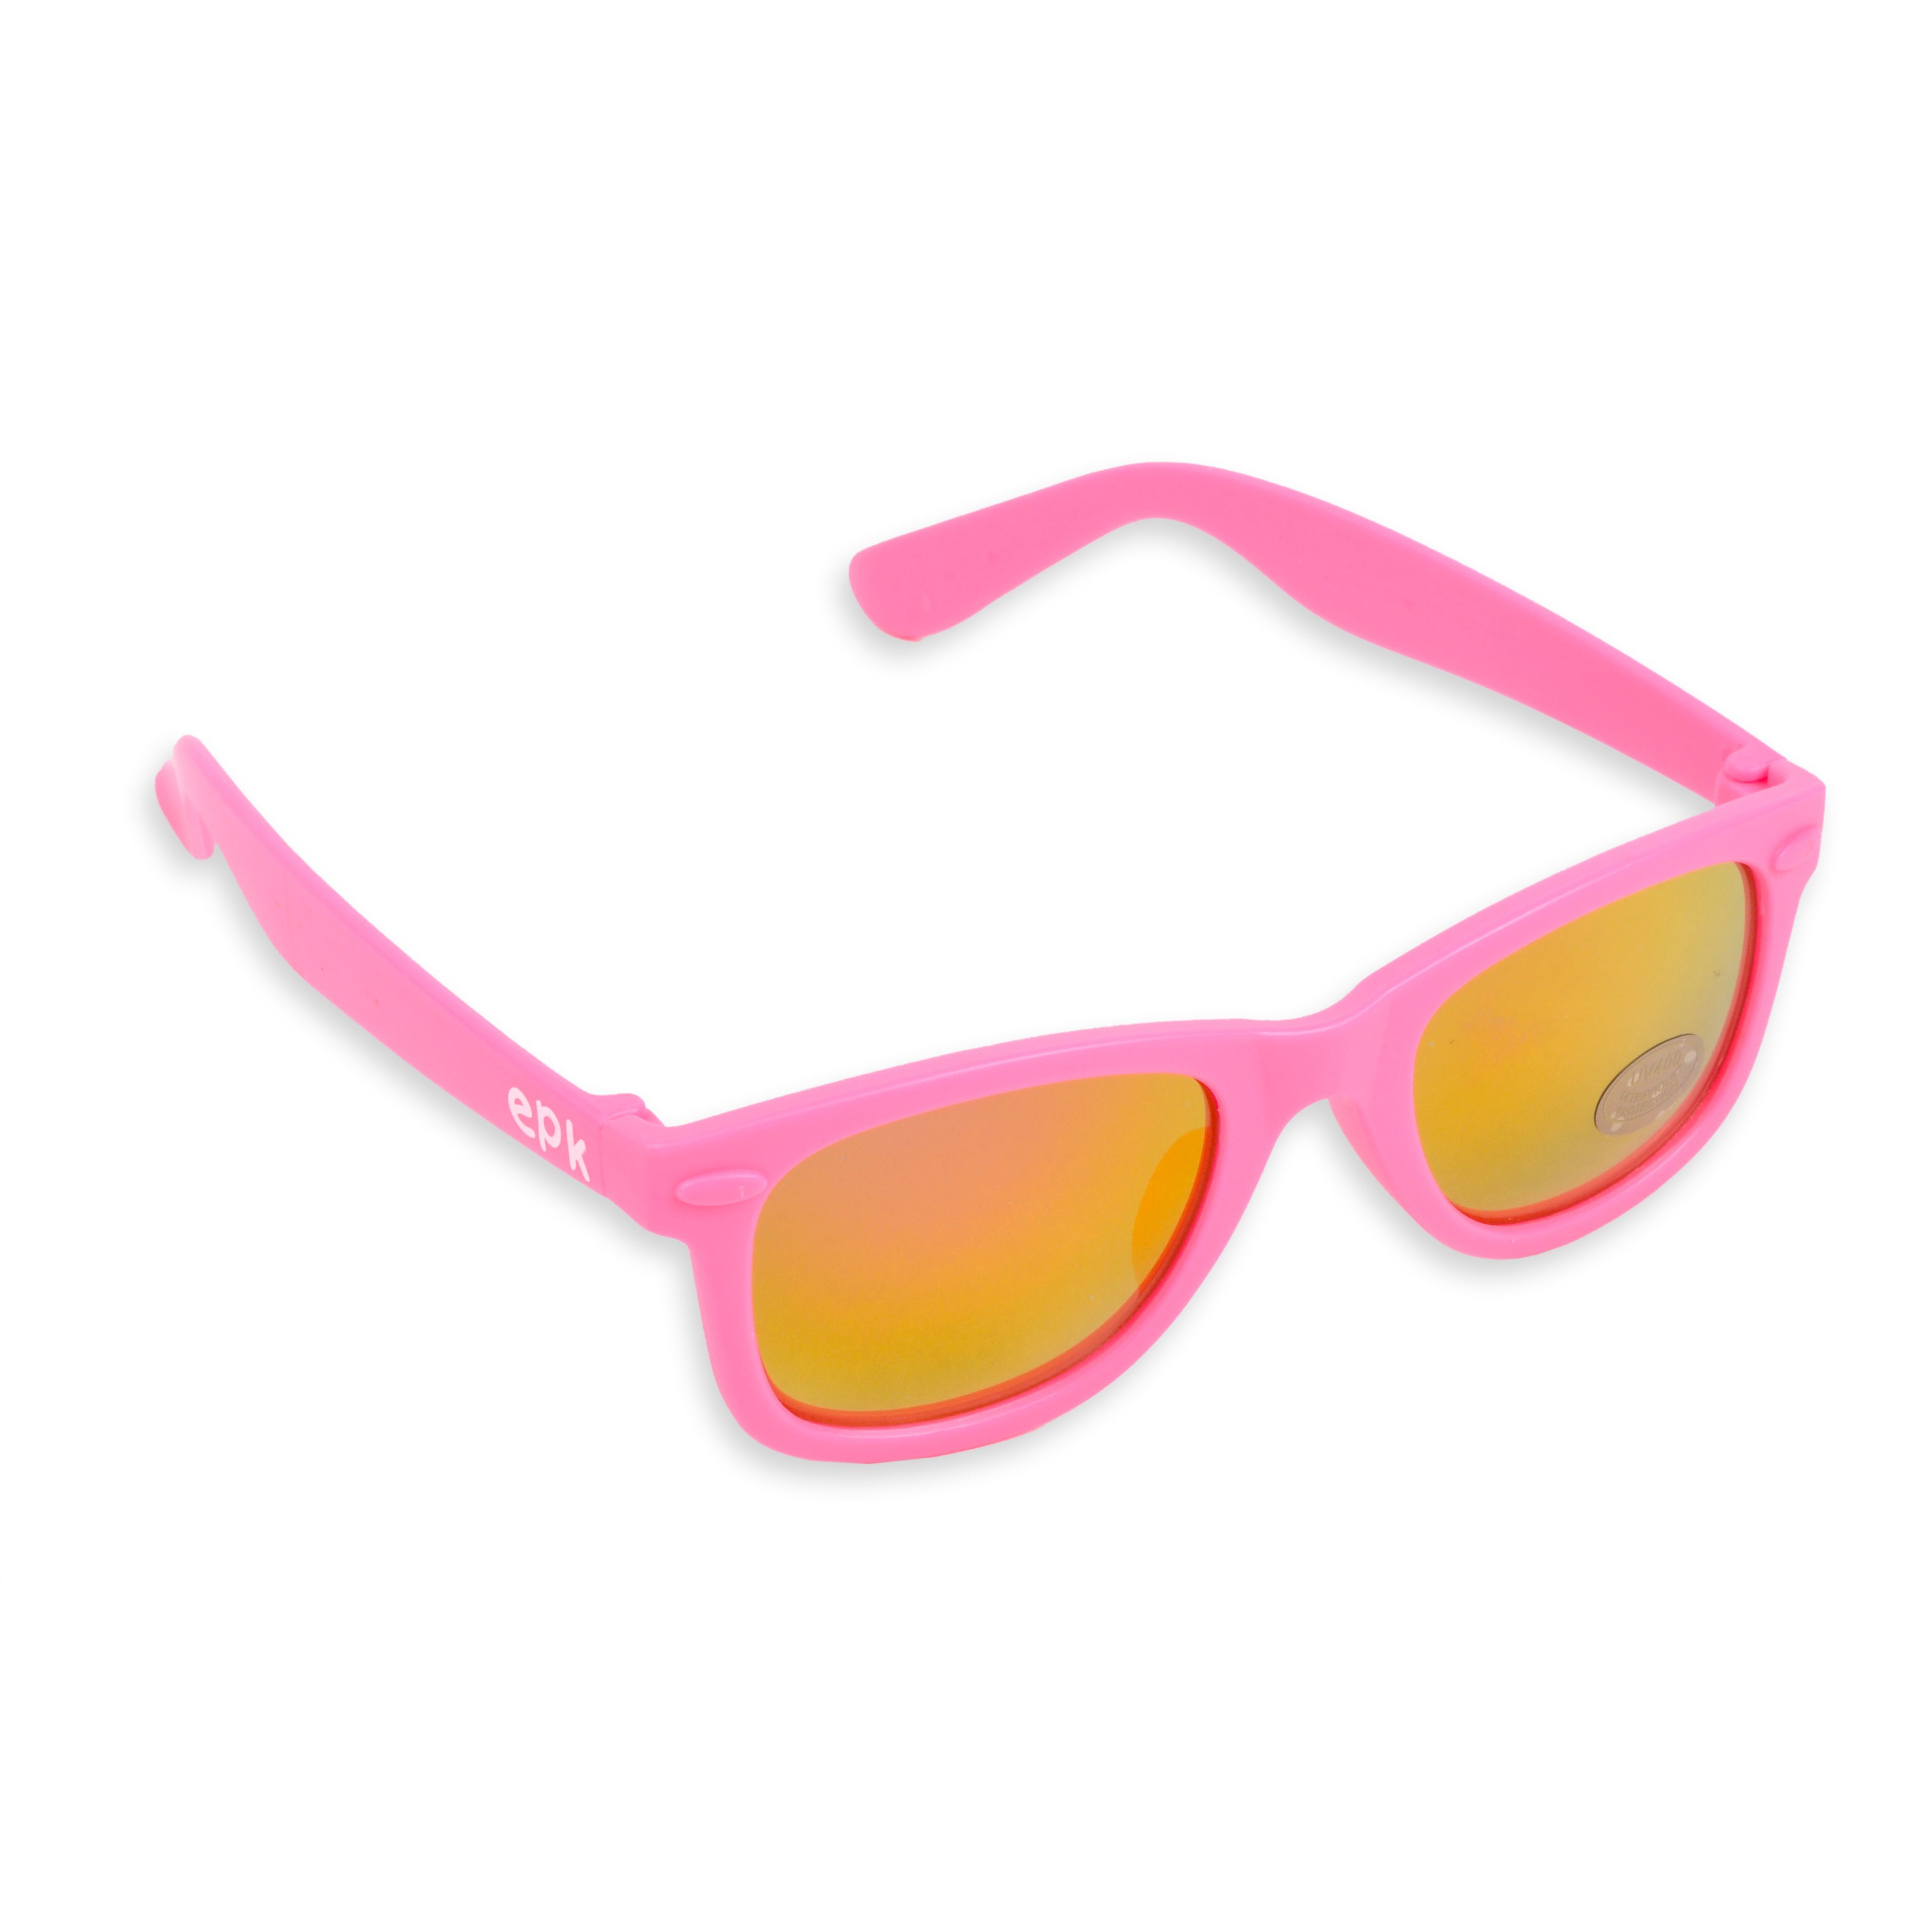 Lentes De Sol Epk Para Niña En Color Rosado Neón Square Sunglass Sunglasses Glasses